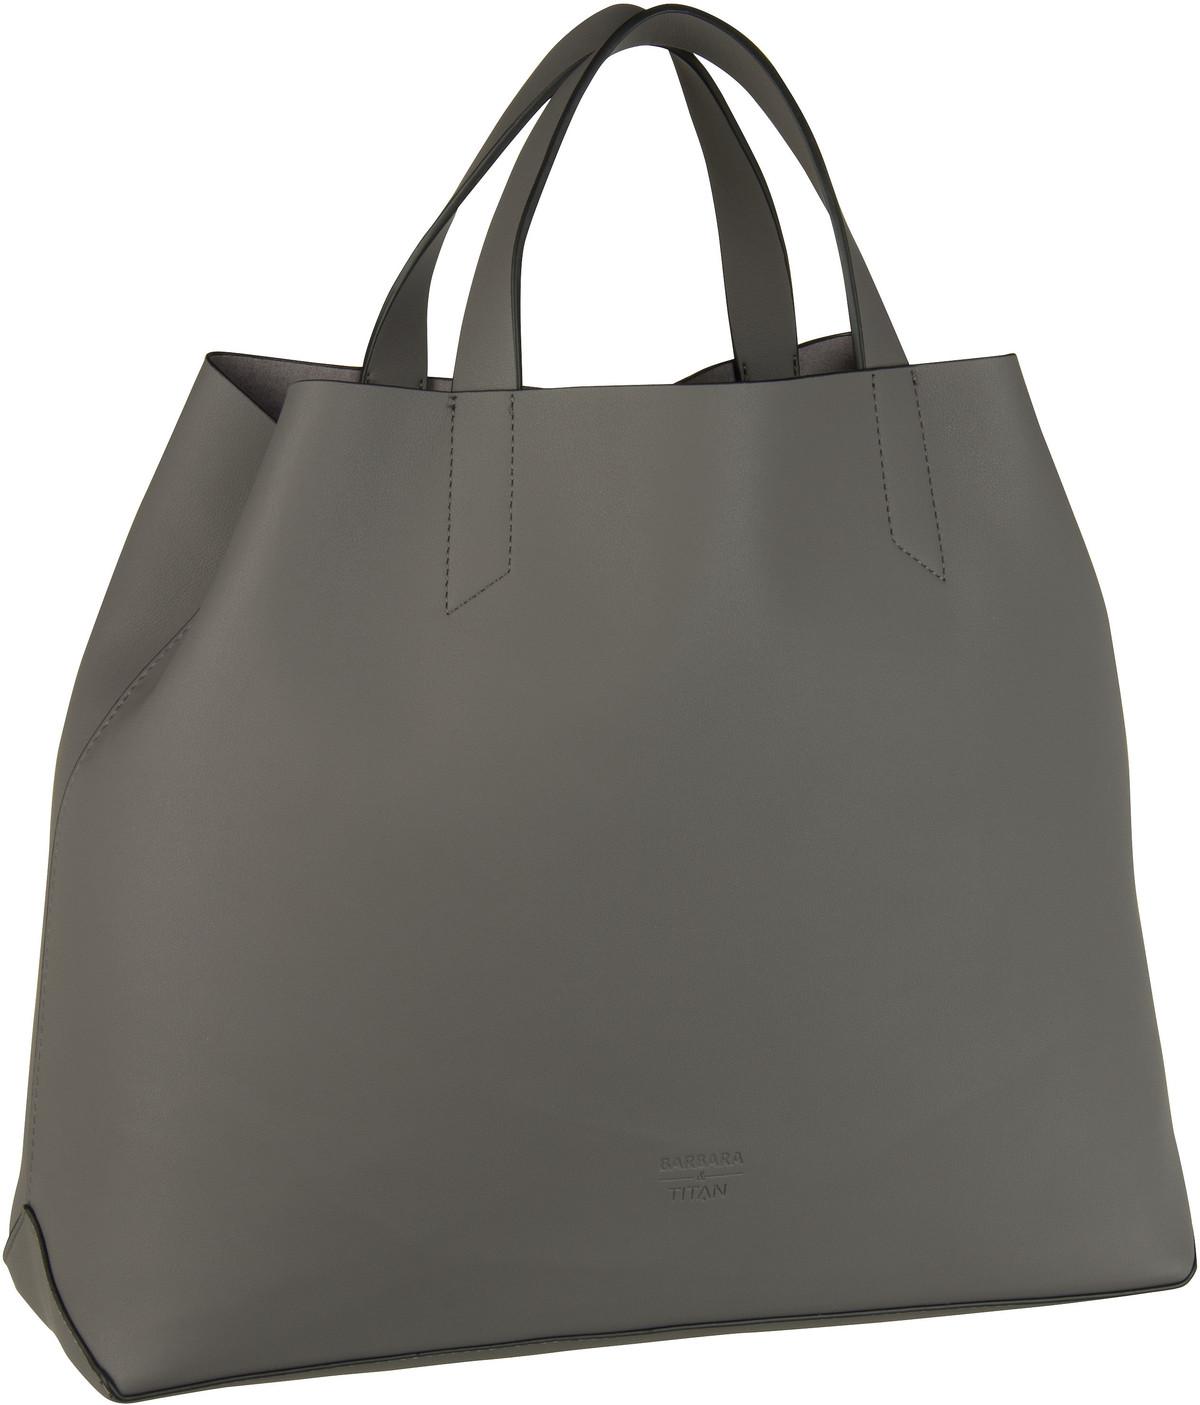 Handtasche Barbara Pure Handbag Grey (16 Liter)